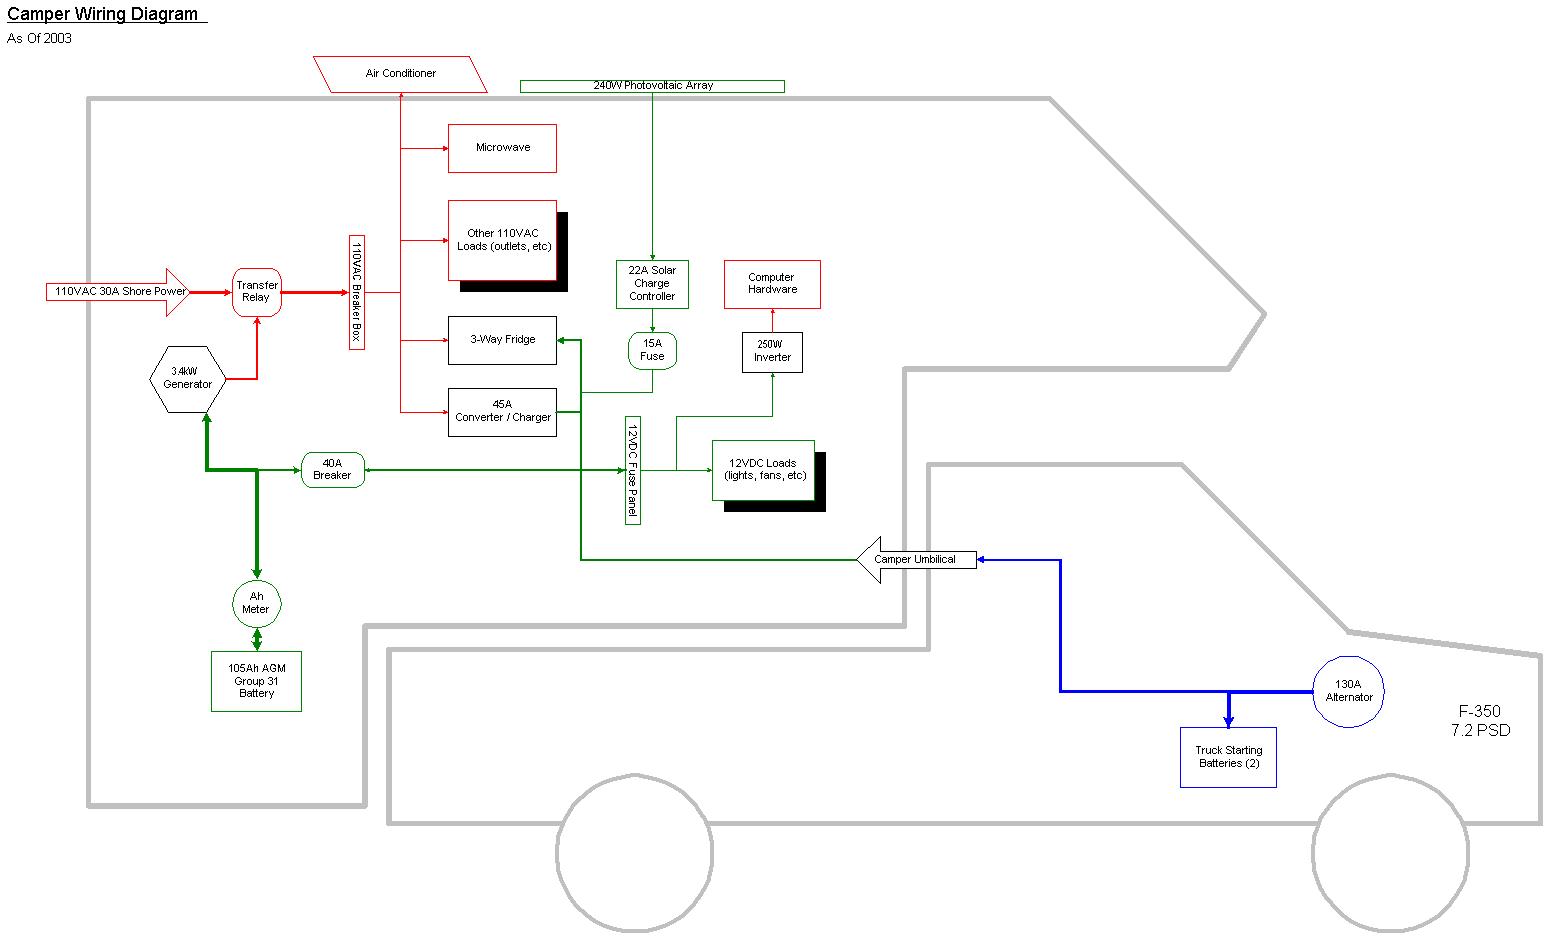 Rv 12V Electrical Wiring Diagram | Manual E-Books - Camper Electrical Wiring Diagram